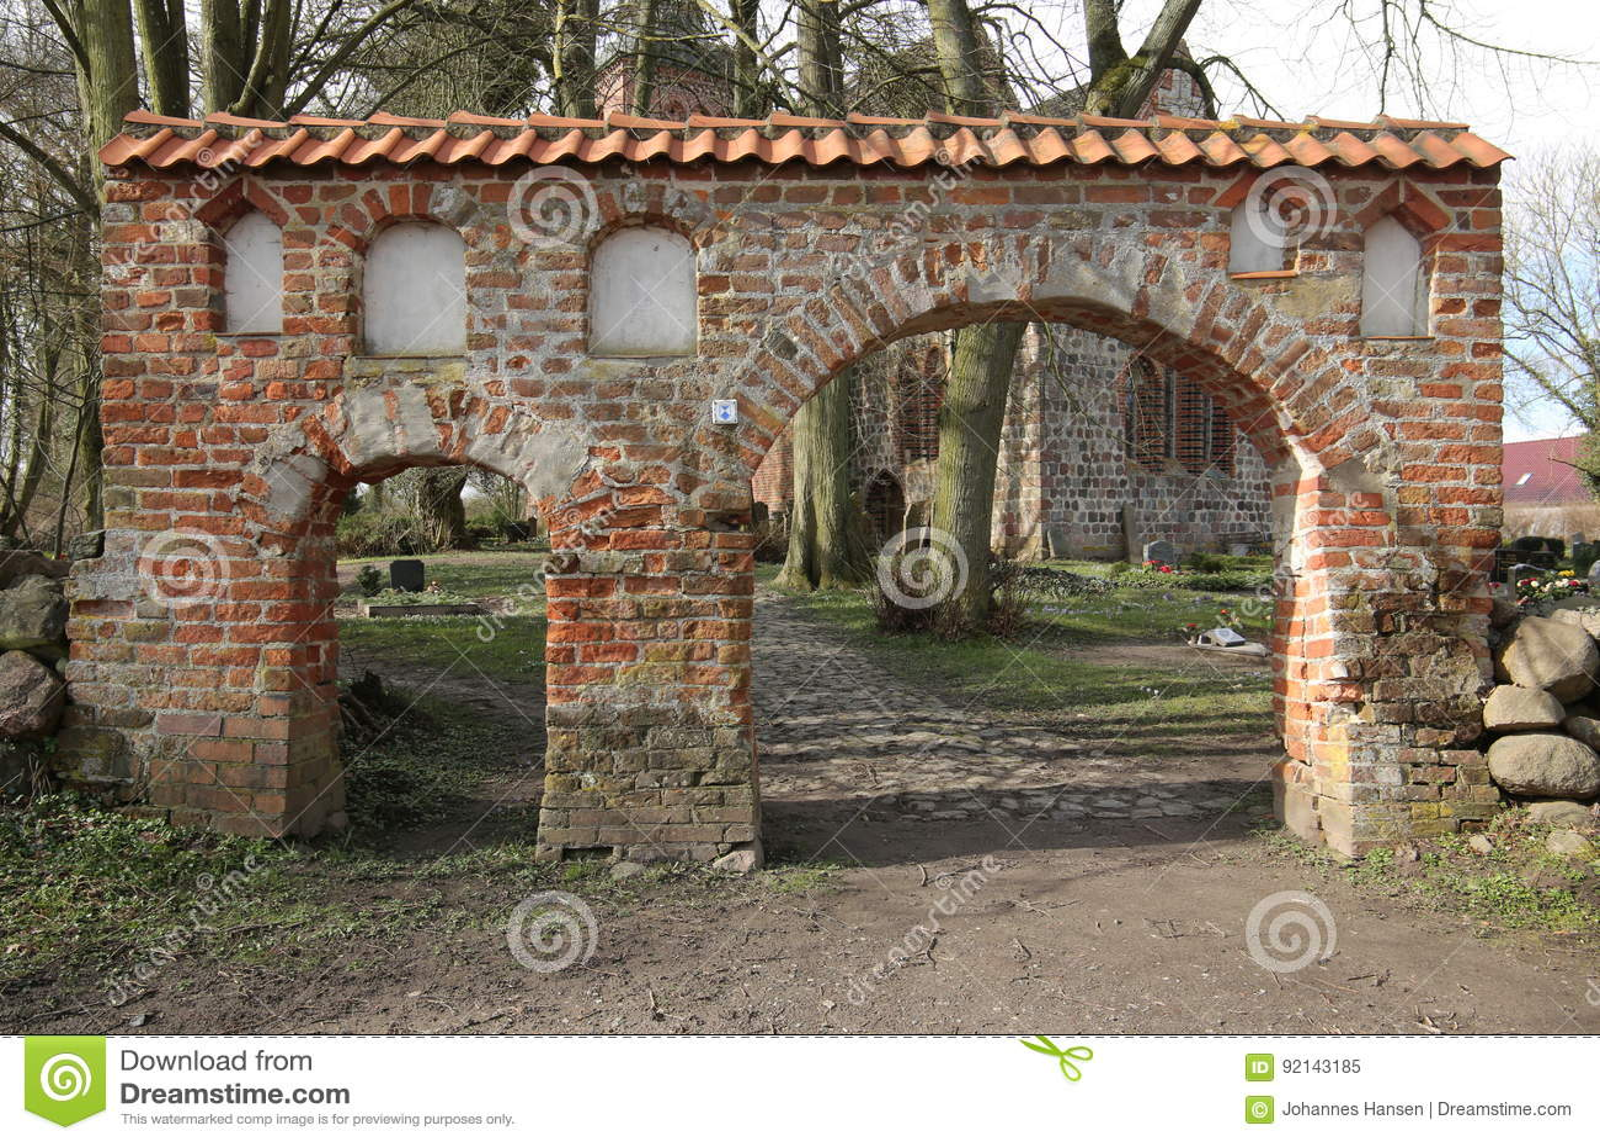 Portal cmentarz w Ordynarnym Kiesow, Mecklenburg-Vorpommern, Niemcy